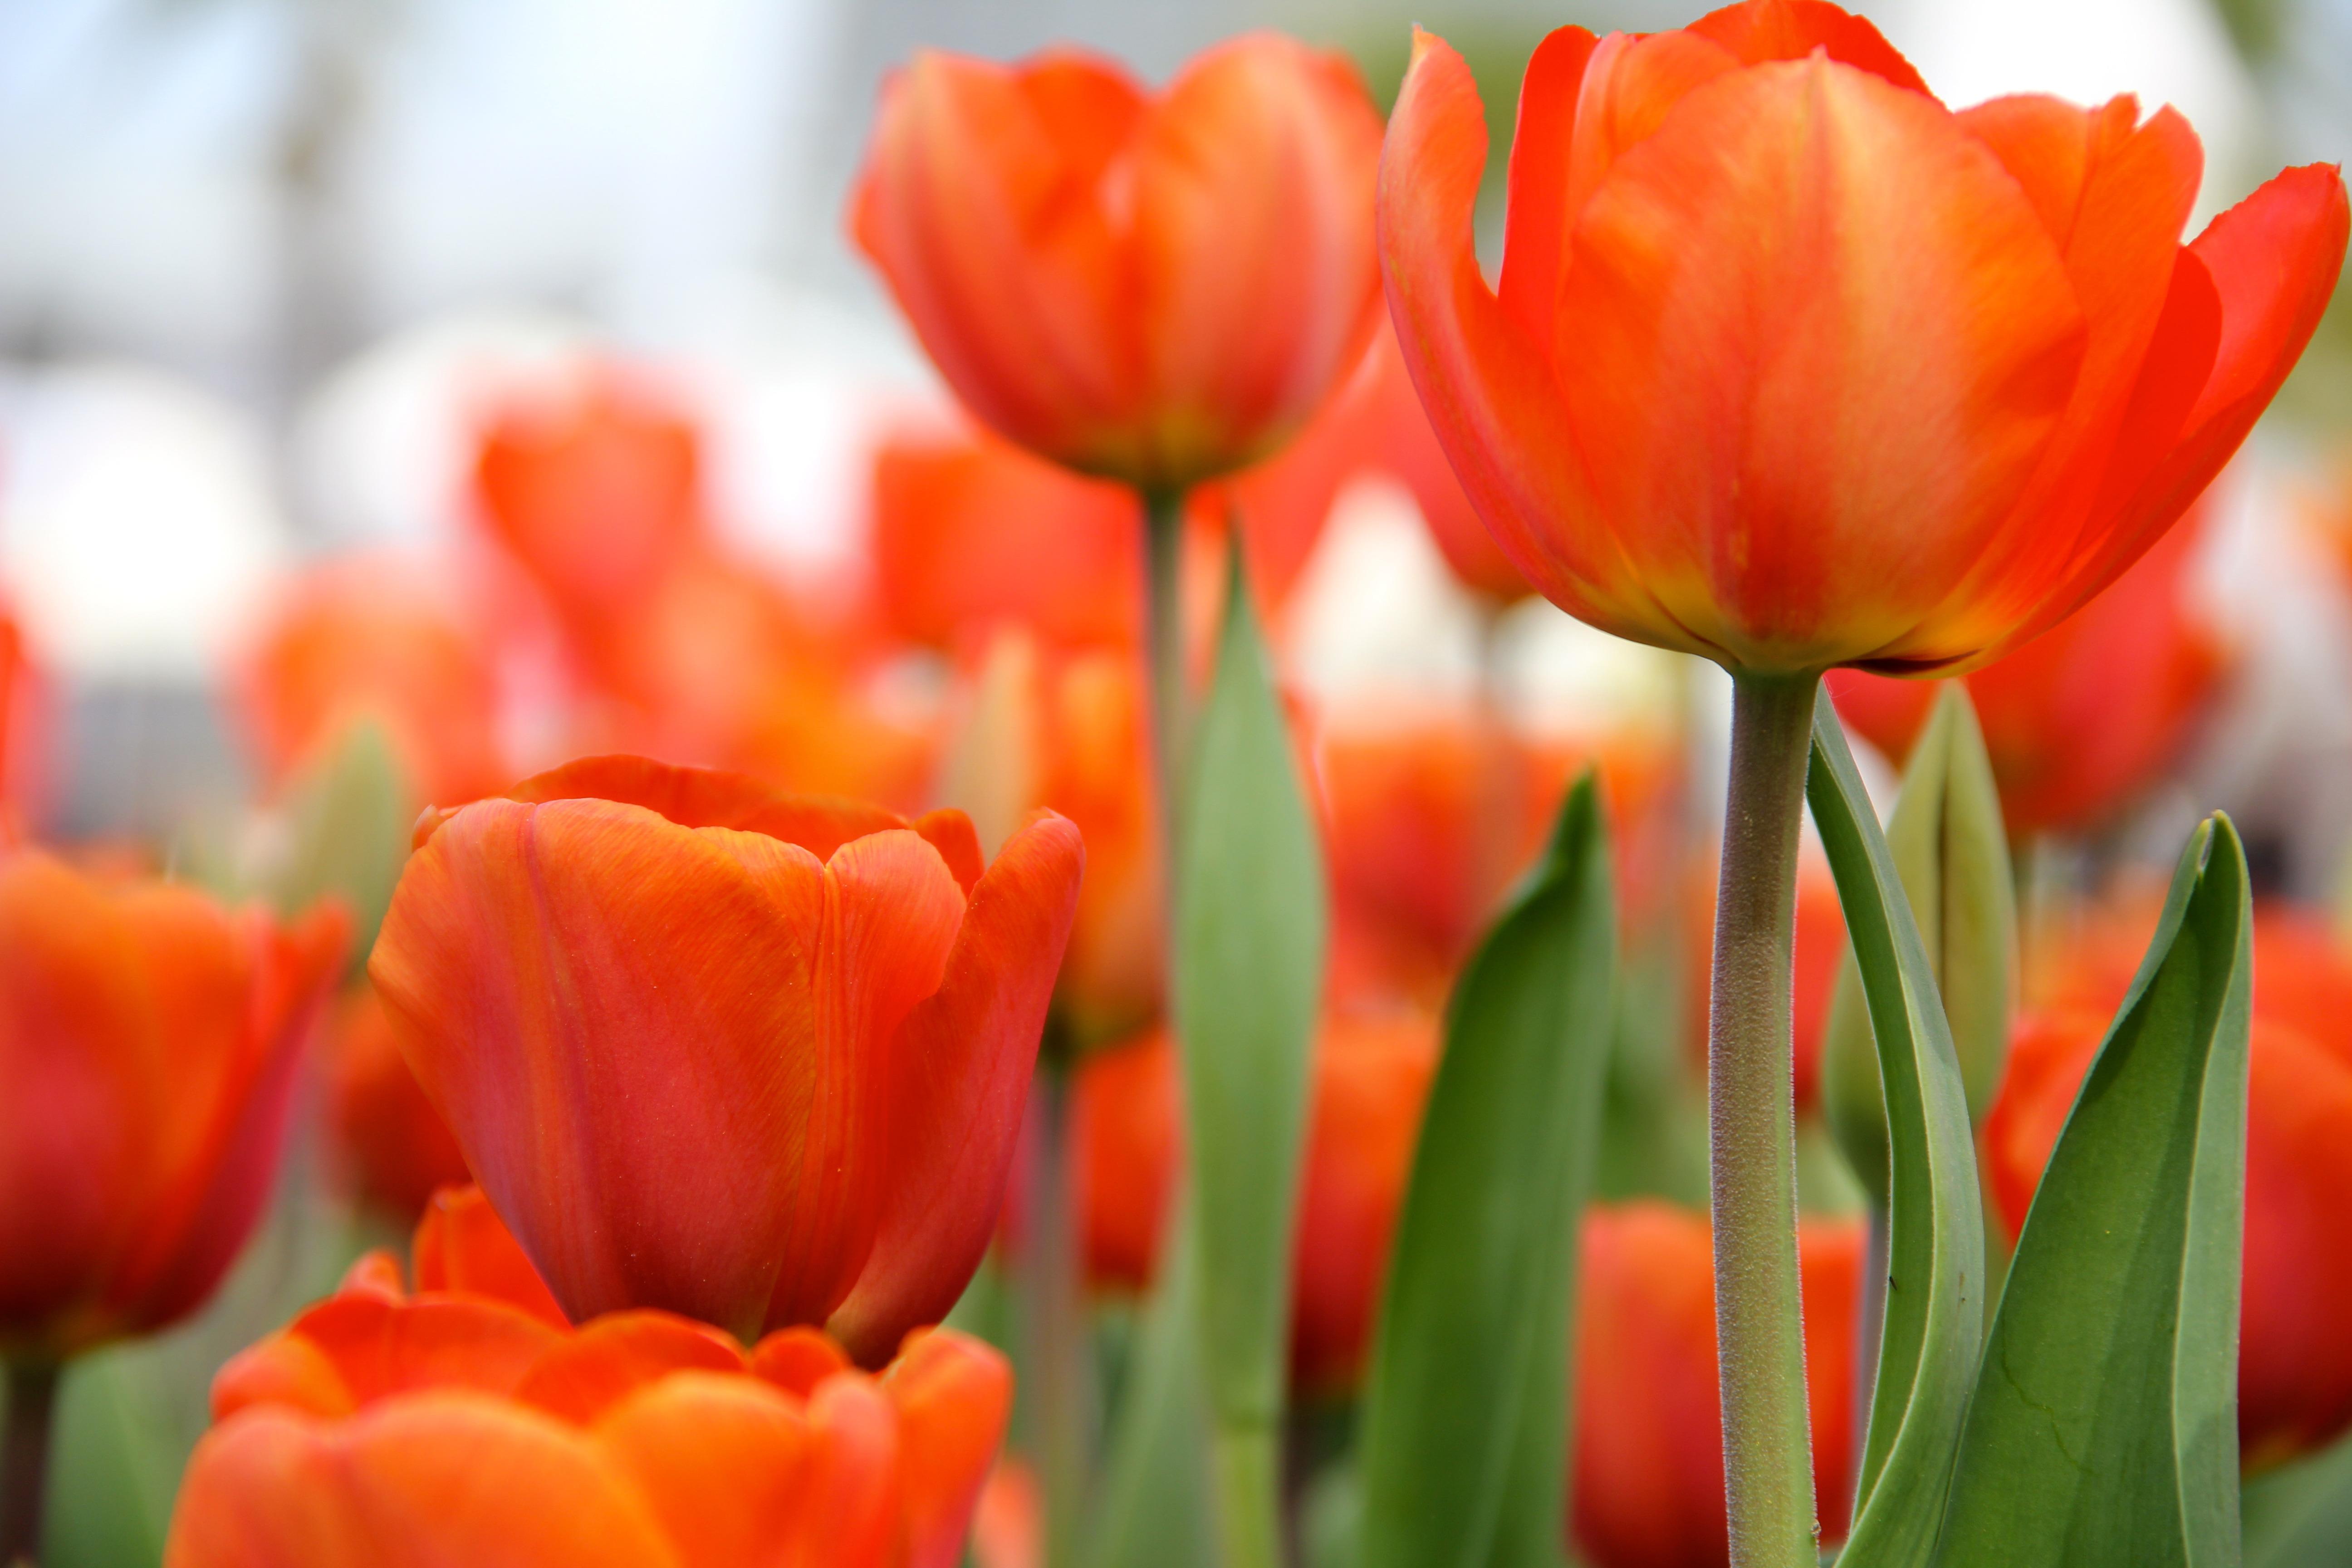 Gambar Menanam Daun Bunga Bunga Tulp Musim Semi Merah Bunga